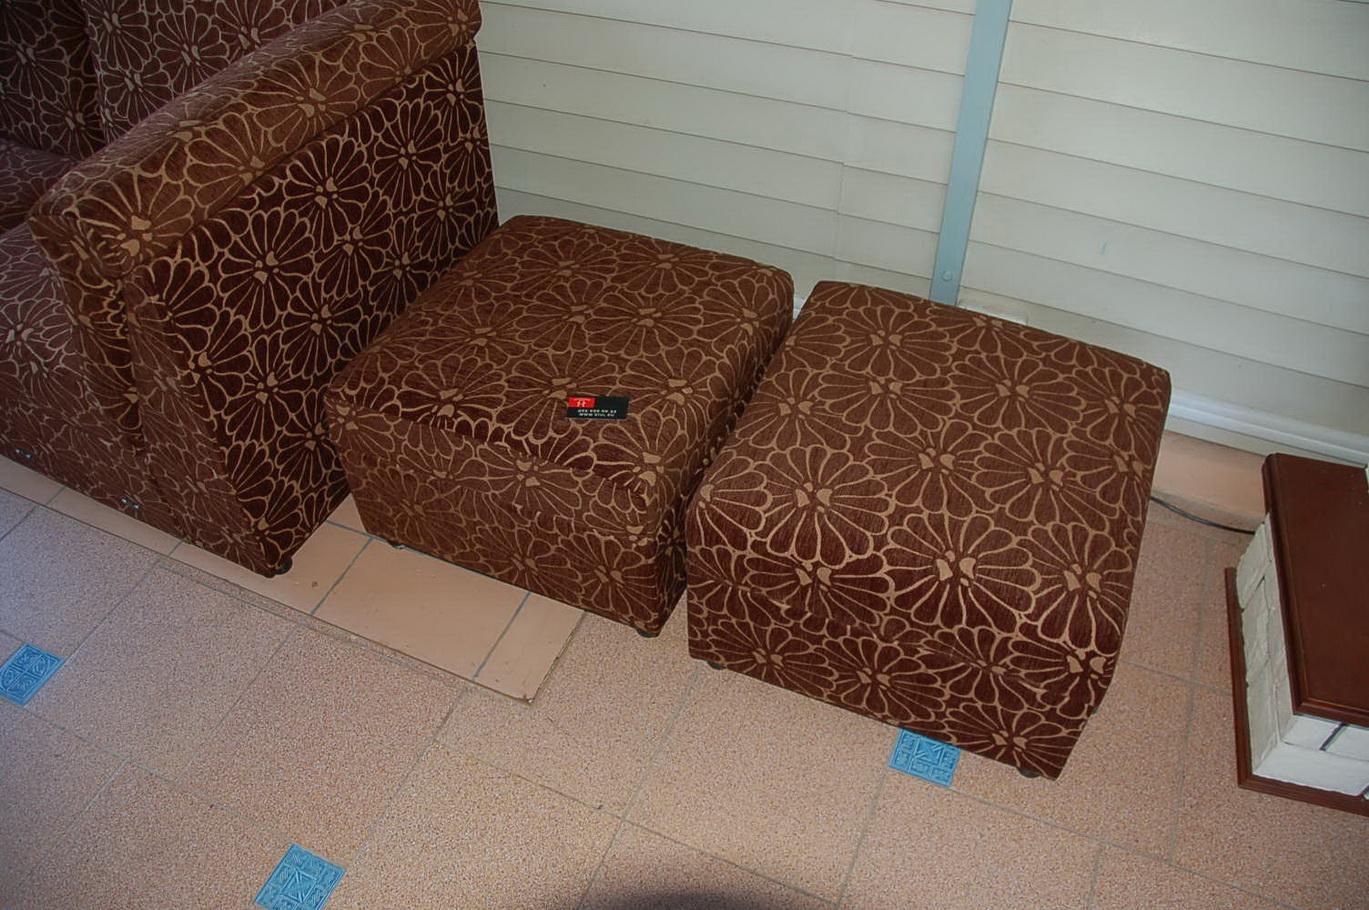 Перетянуть тканью диван своими руками